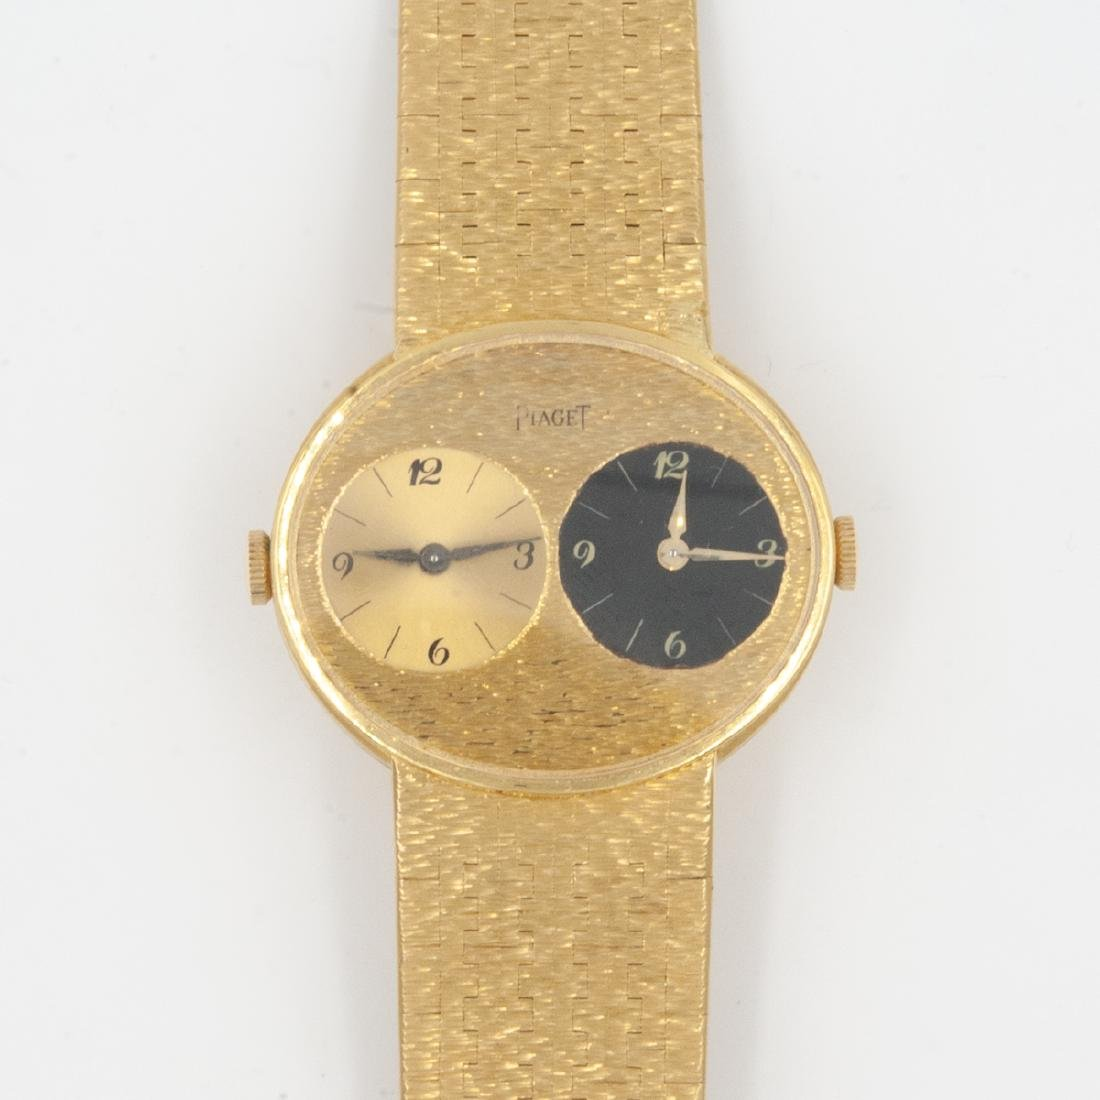 Vintage Piaget dual time watch